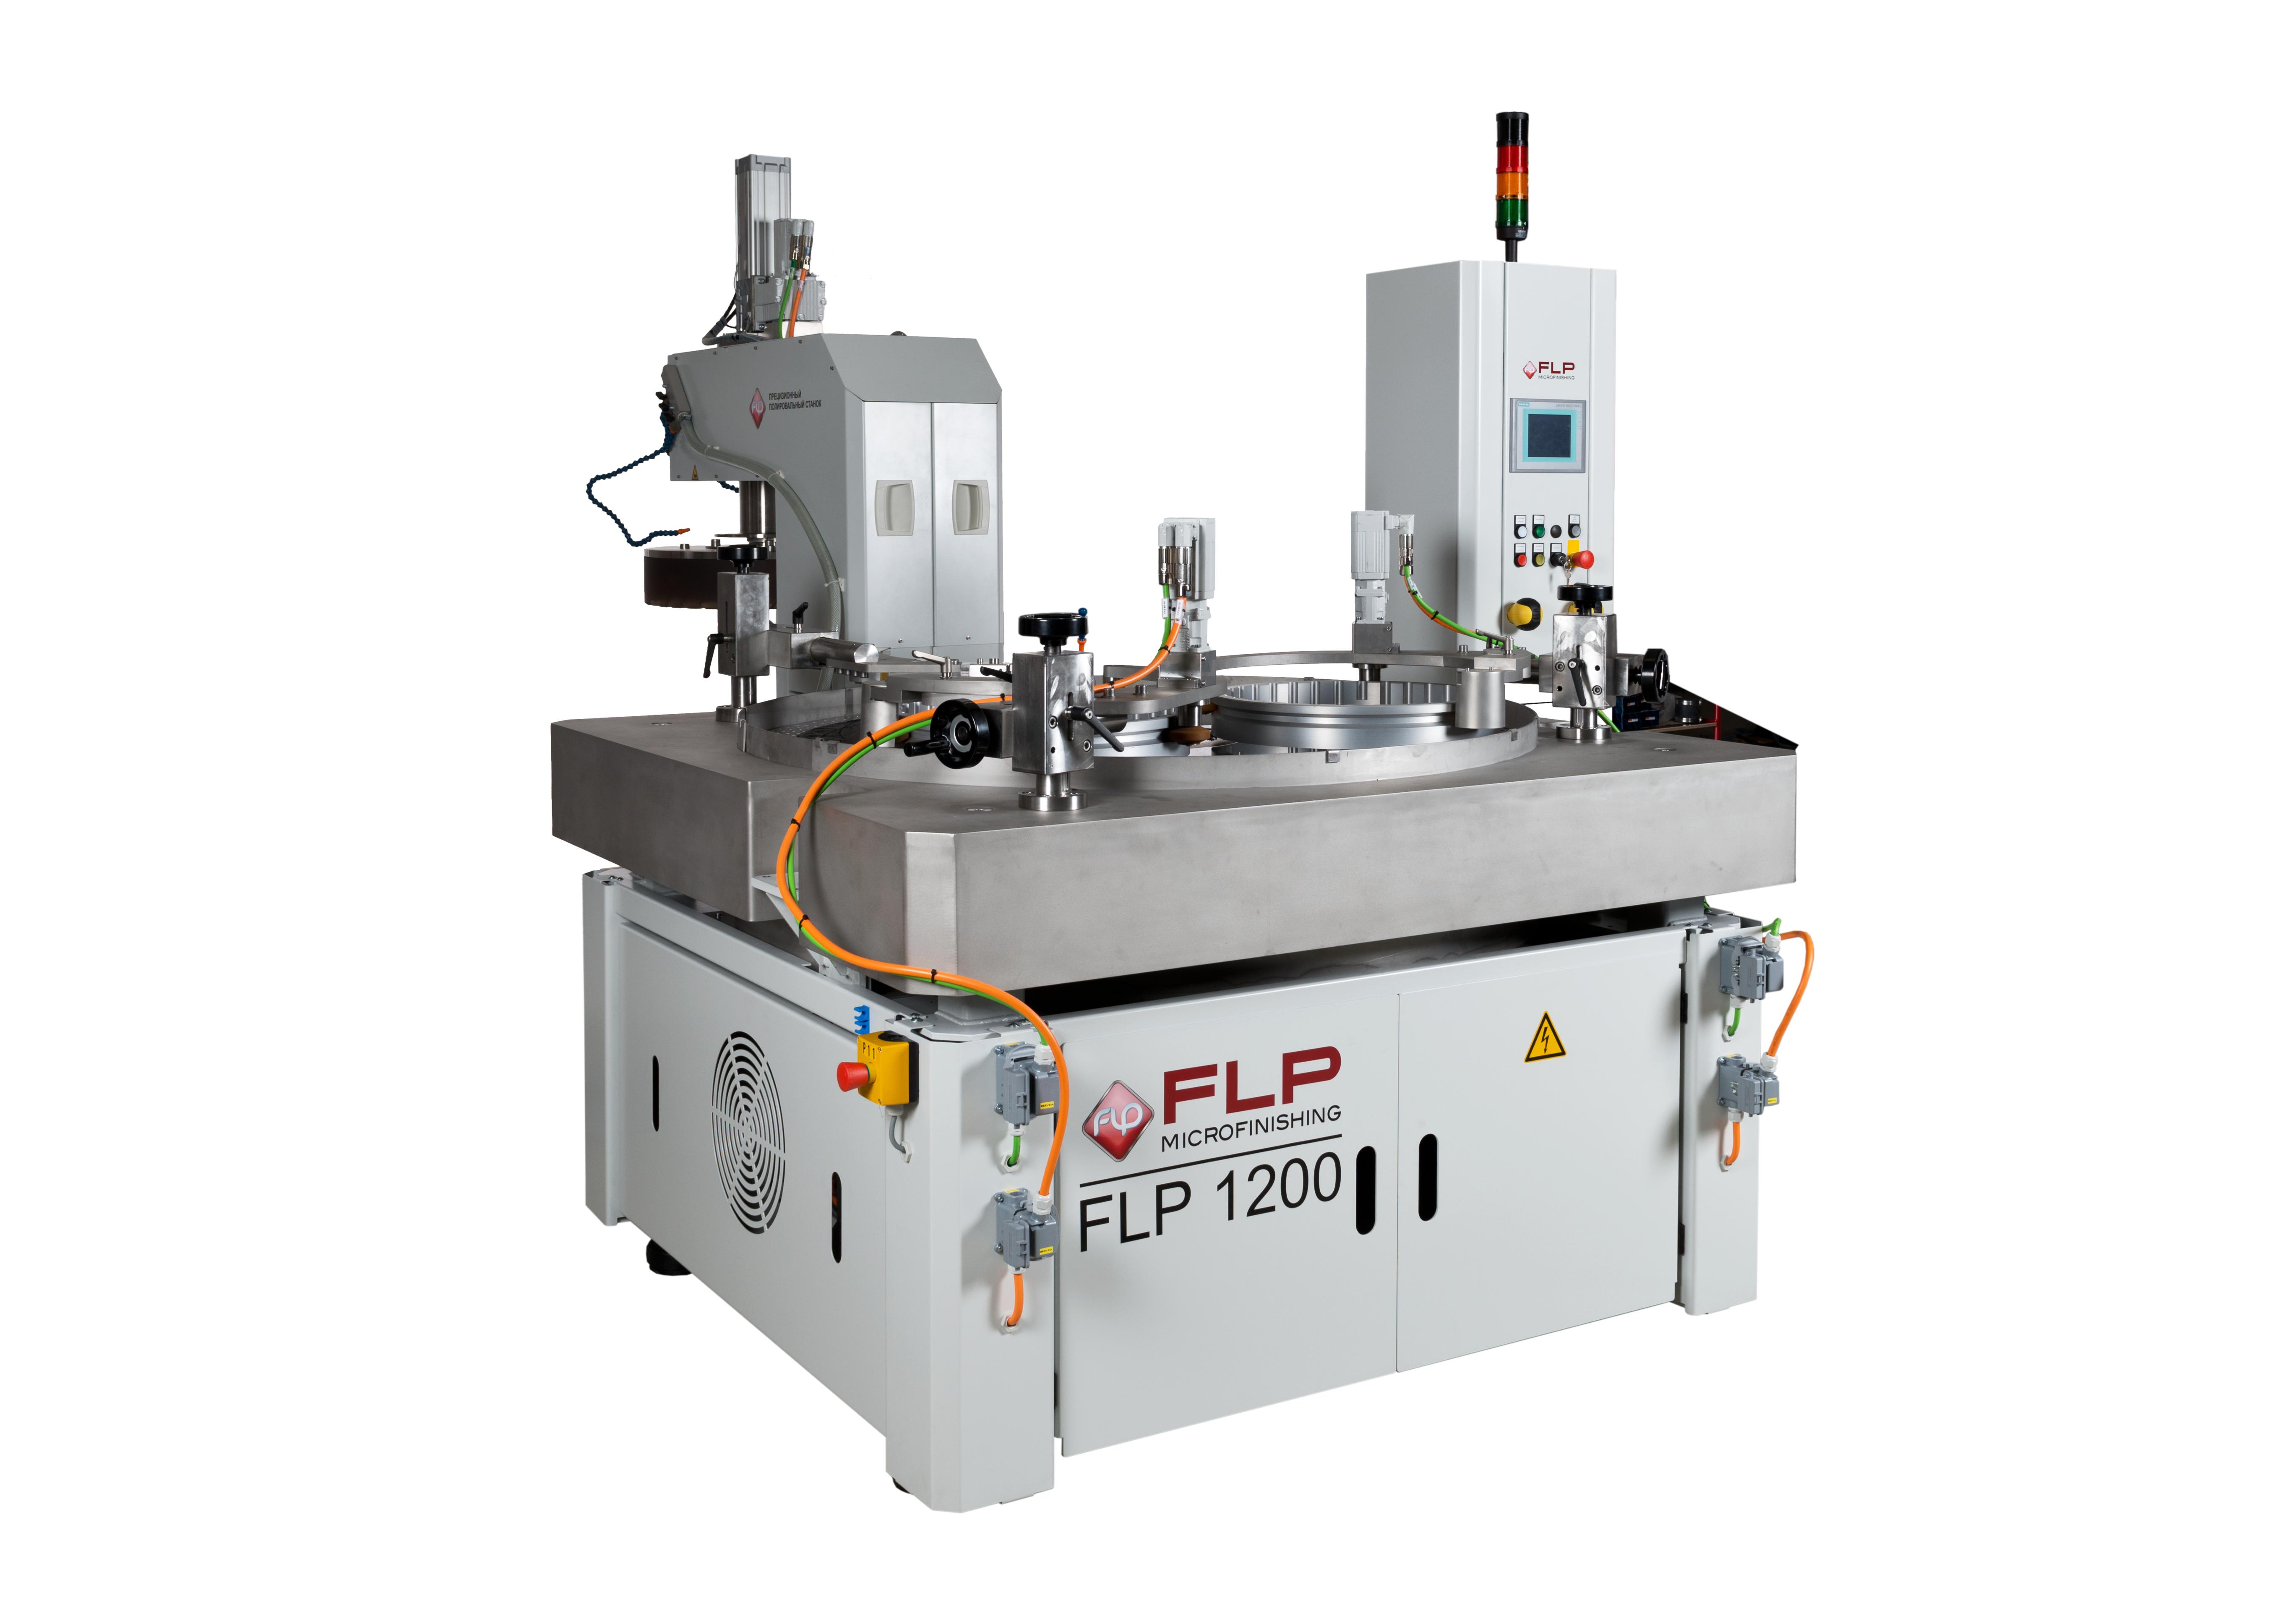 Foto de FLP Microfinishing GmbH